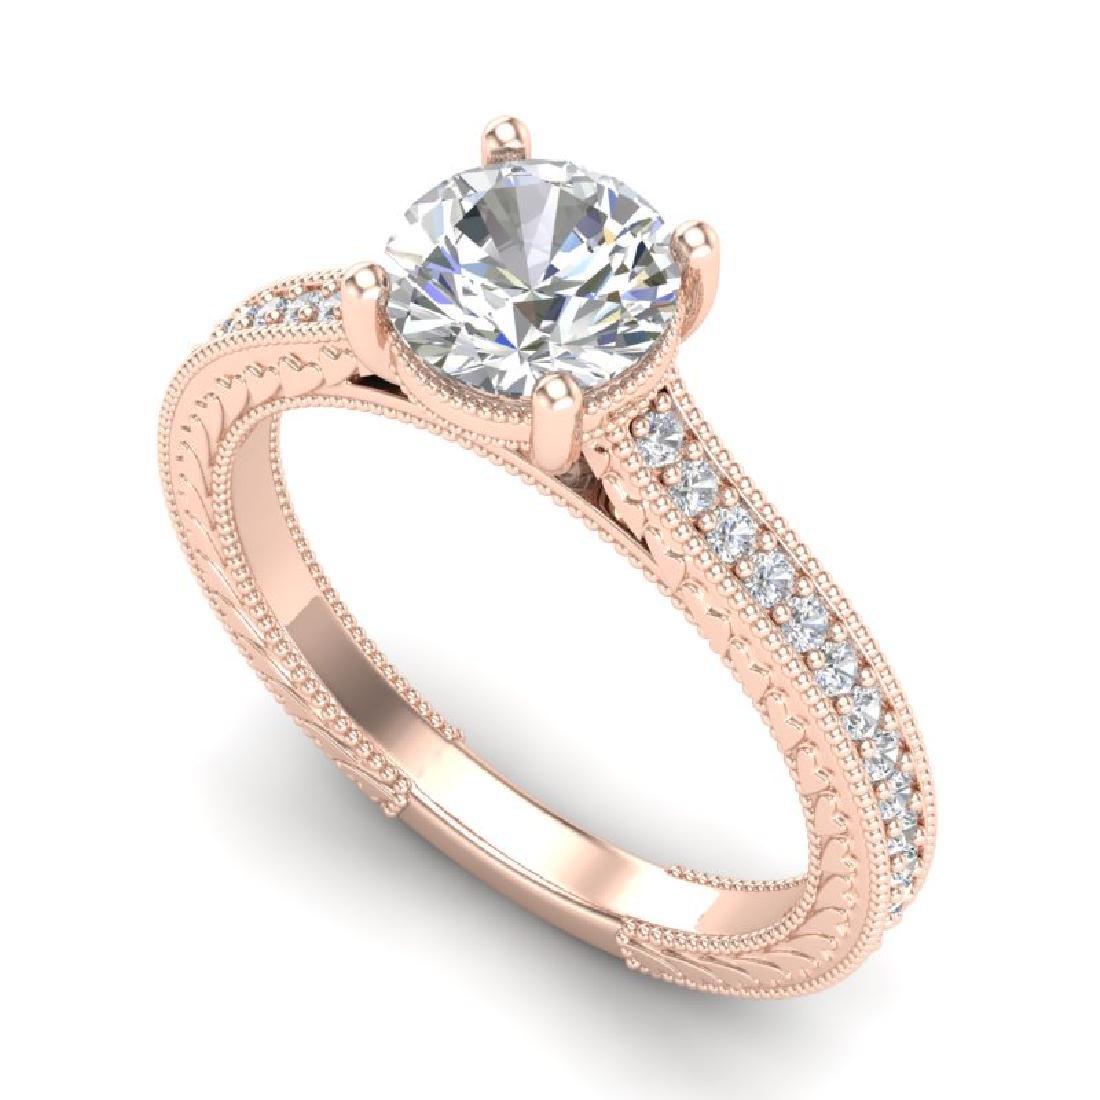 1.45 CTW VS/SI Diamond Solitaire Art Deco Ring 18K Rose